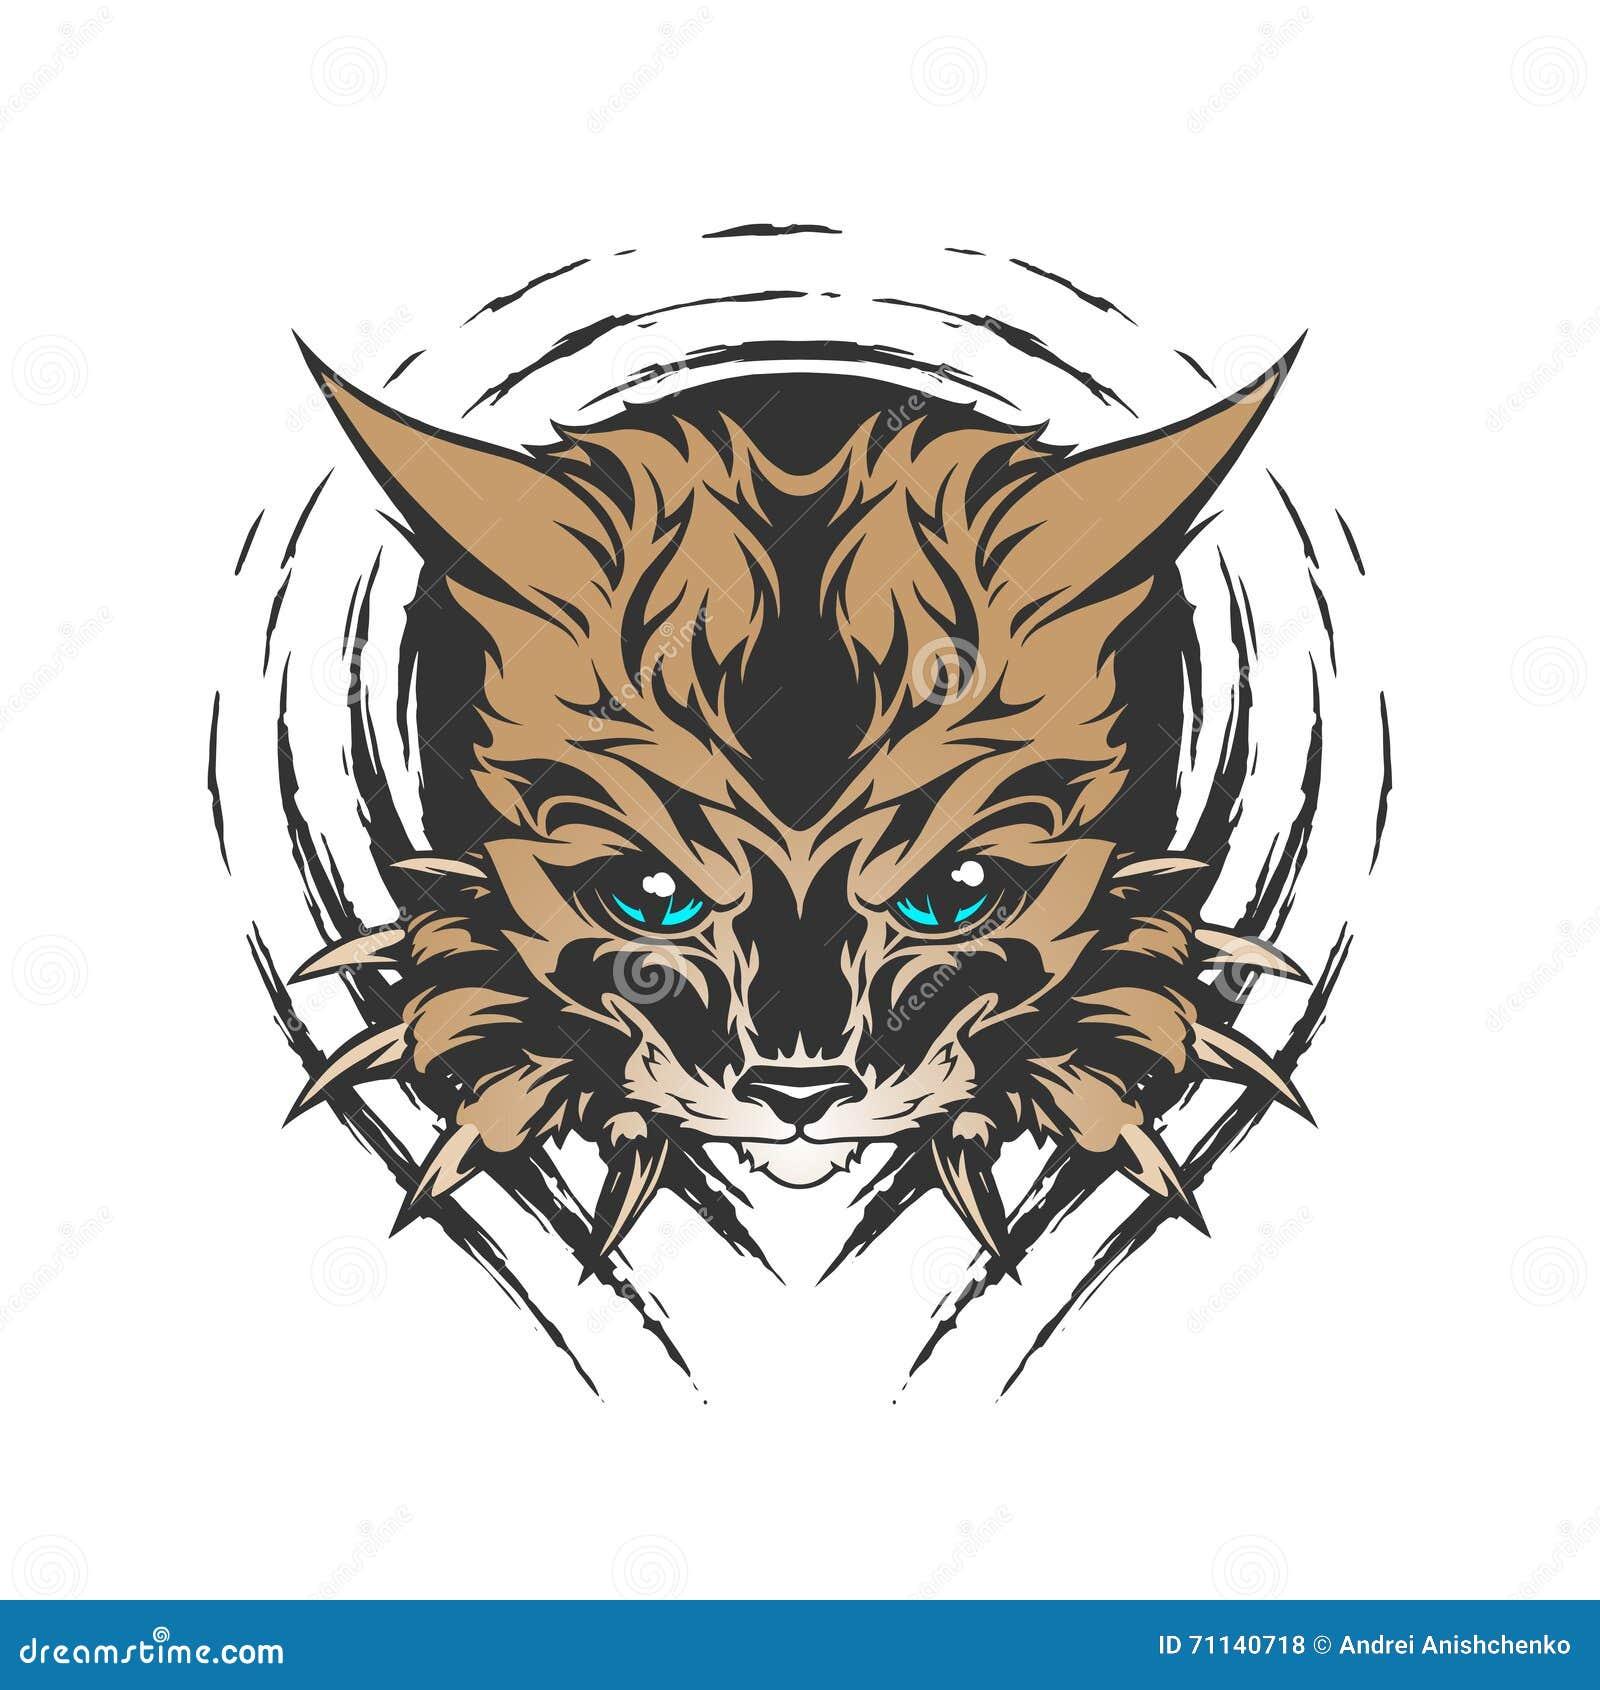 Kot ilustracja w tatuażu stylu